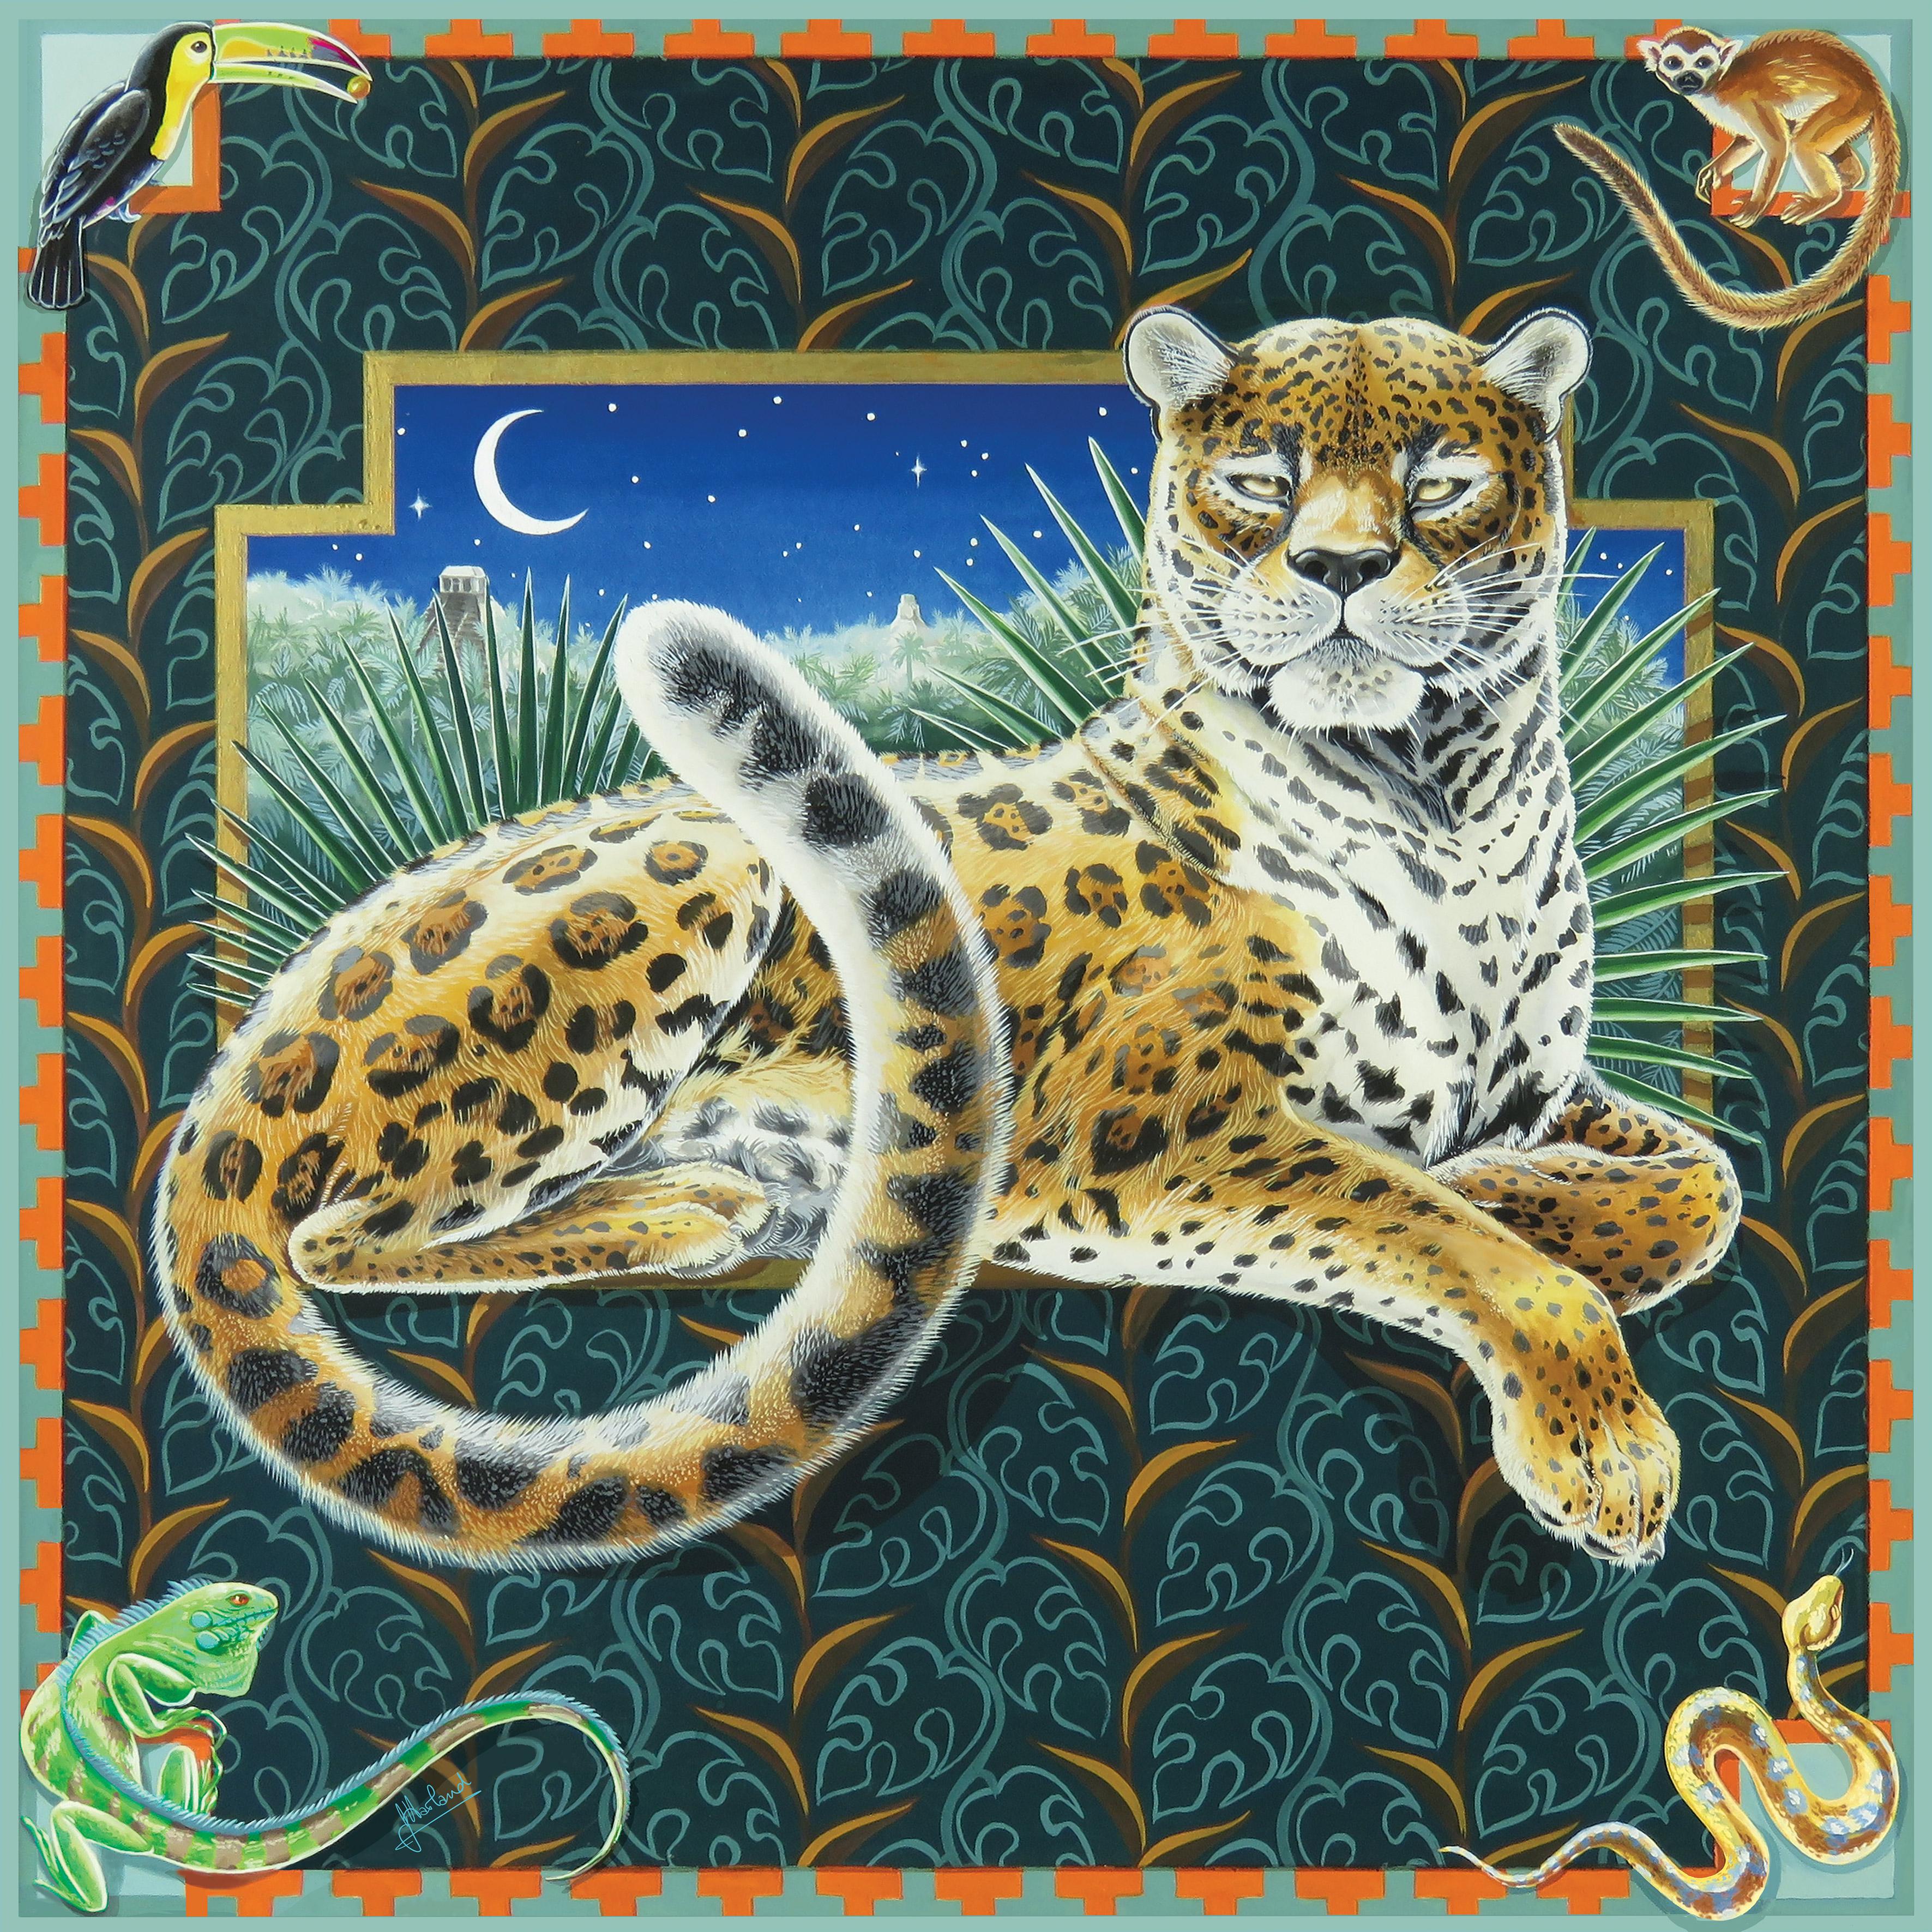 Jaguar, Queen of the Jungle